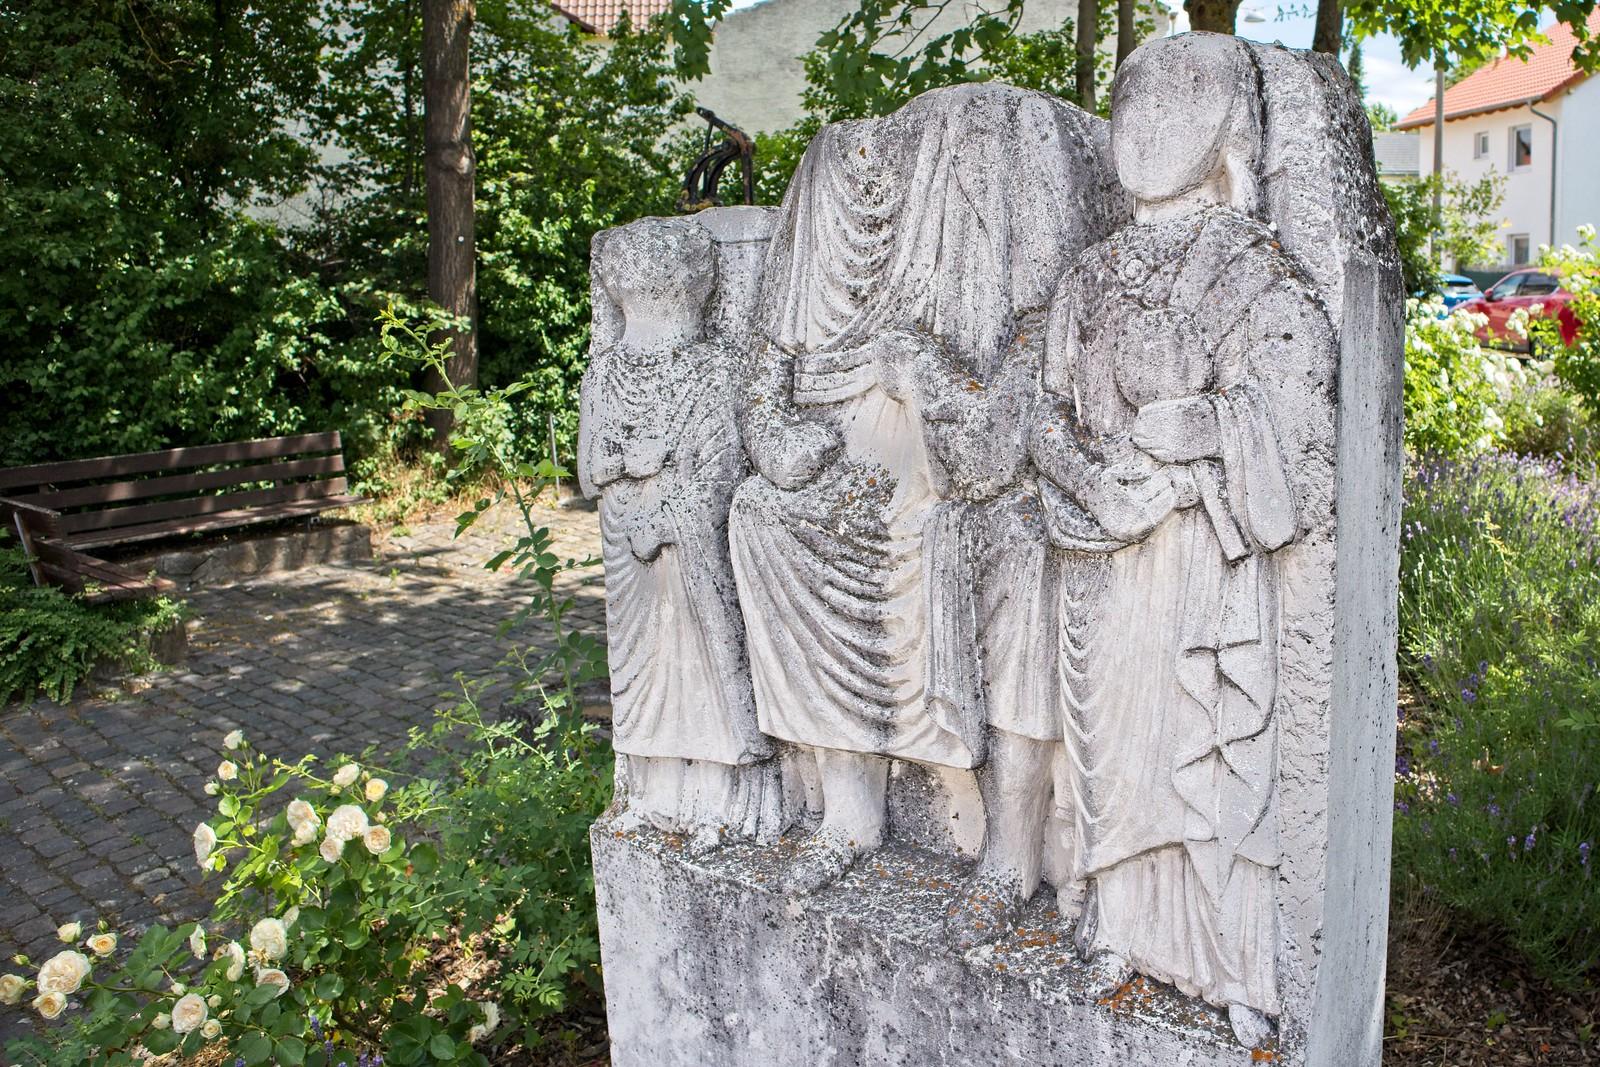 Keltisch-Römischer Grabstein in Selzen (Kopie, Original im Landesmuseum Mainz)